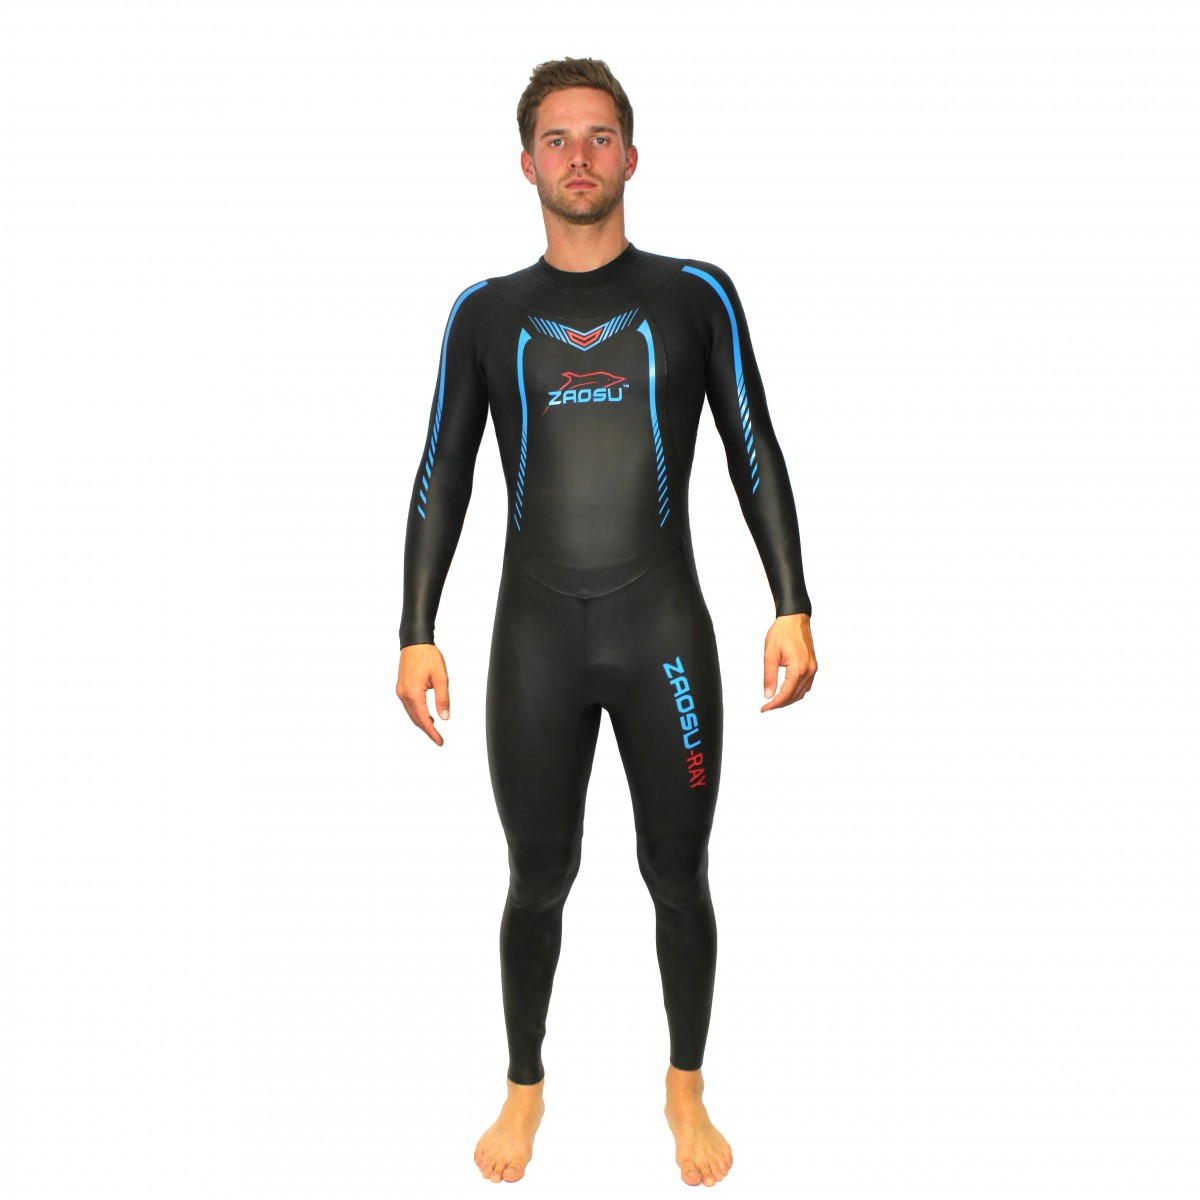 zaosu ray 2 5 triathlon neoprenanzug herren ebay. Black Bedroom Furniture Sets. Home Design Ideas